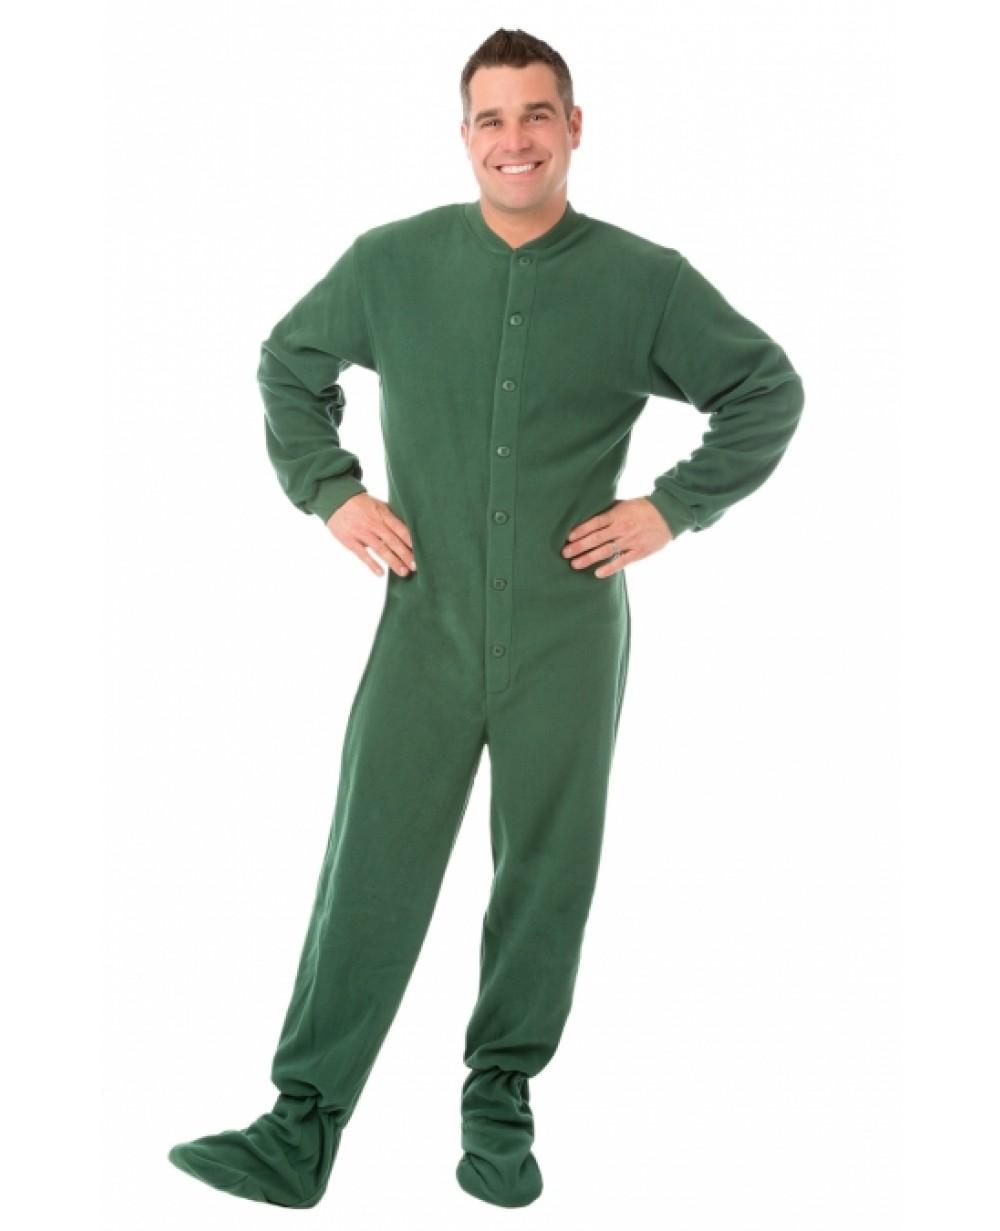 a25a73de5937 More Views. Hunter Green Fleece Adult Footed Pajamas